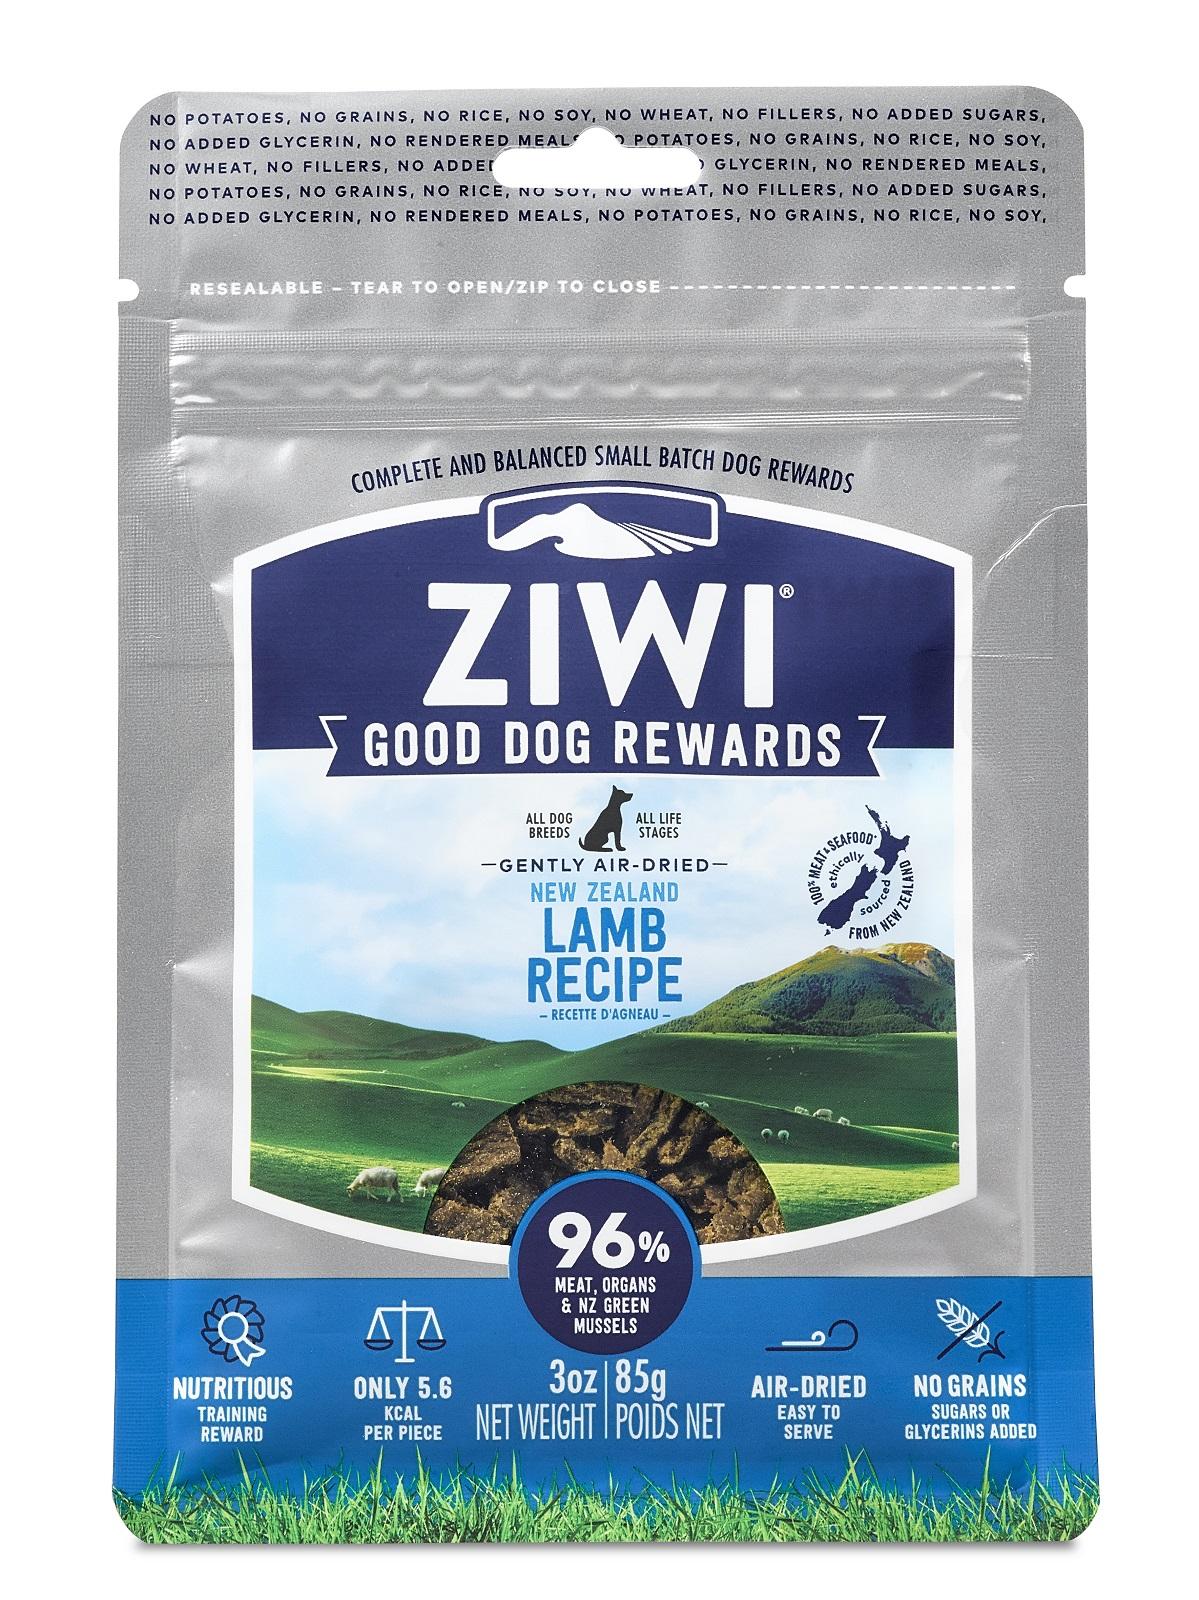 ZIWI Good Dog Rewards Lamb Recipe Air-Dried Dog Treats, 3-oz (Size: 3-oz, Weights: 3ounces) Image